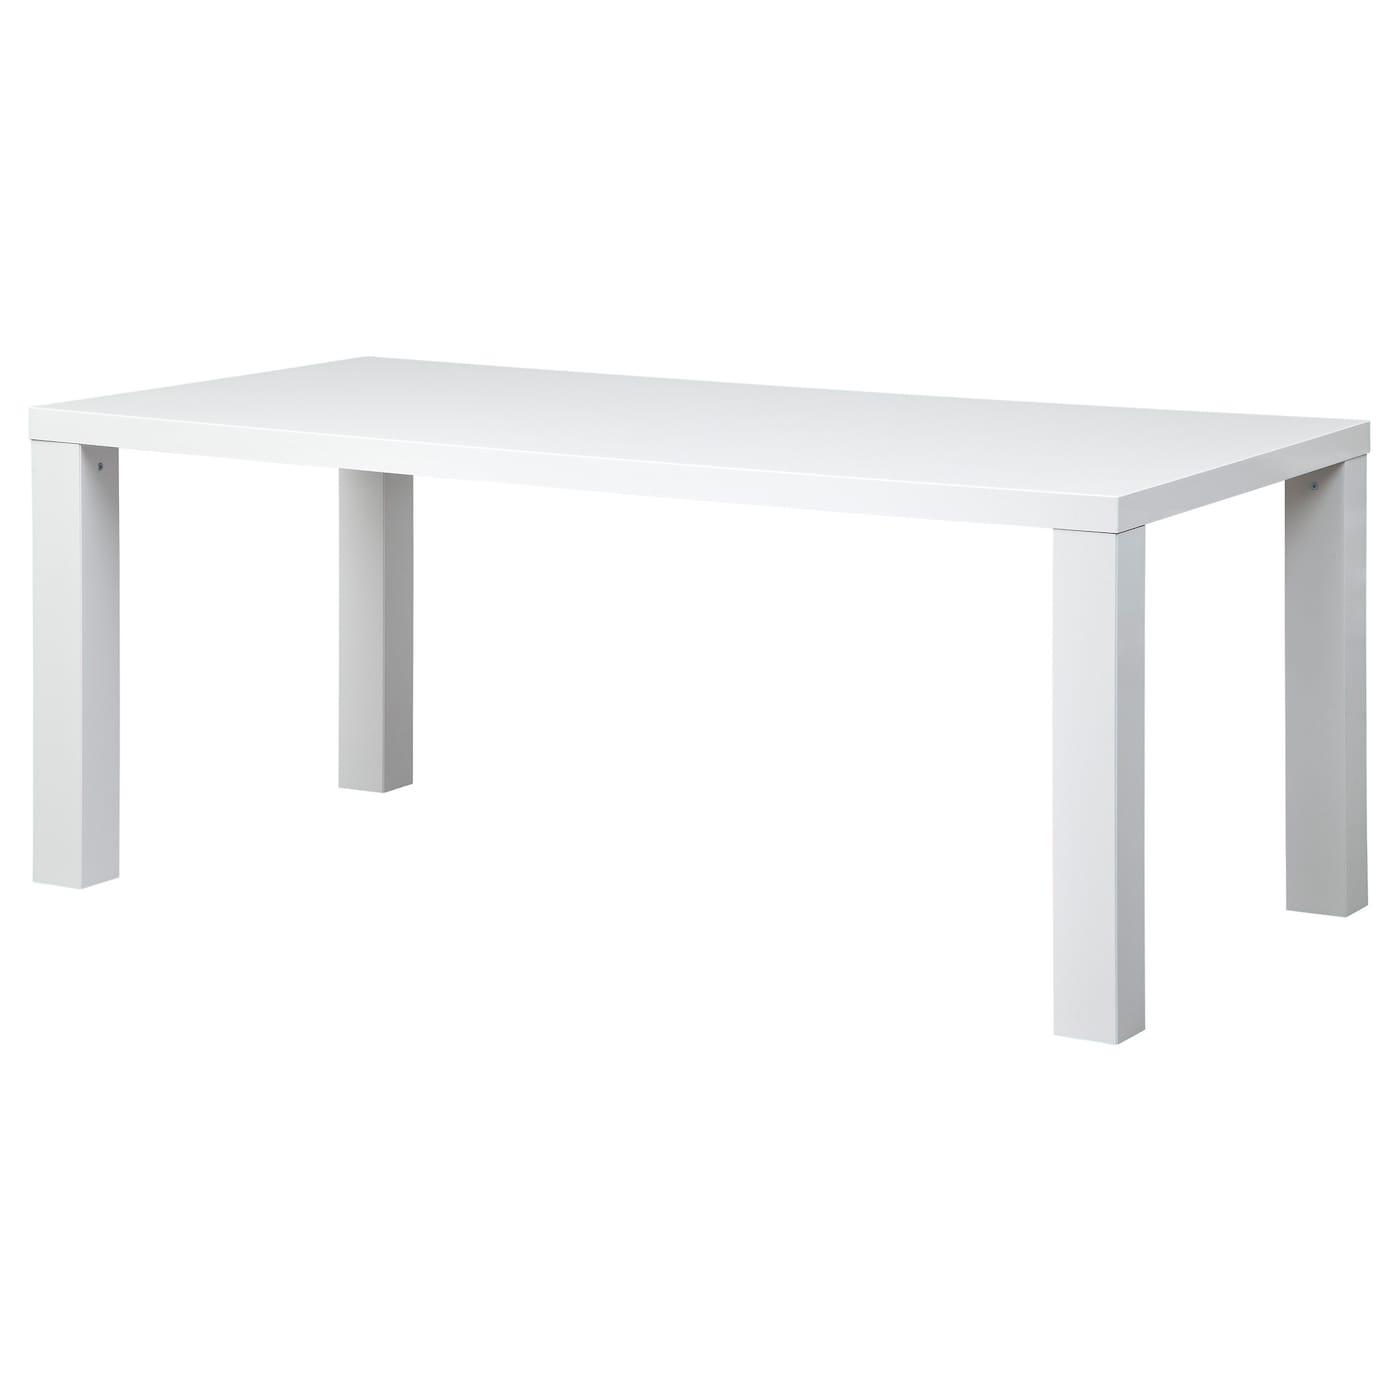 Toresund table blanc brillant 180x90 cm ikea - Ikea mesa lack blanca ...